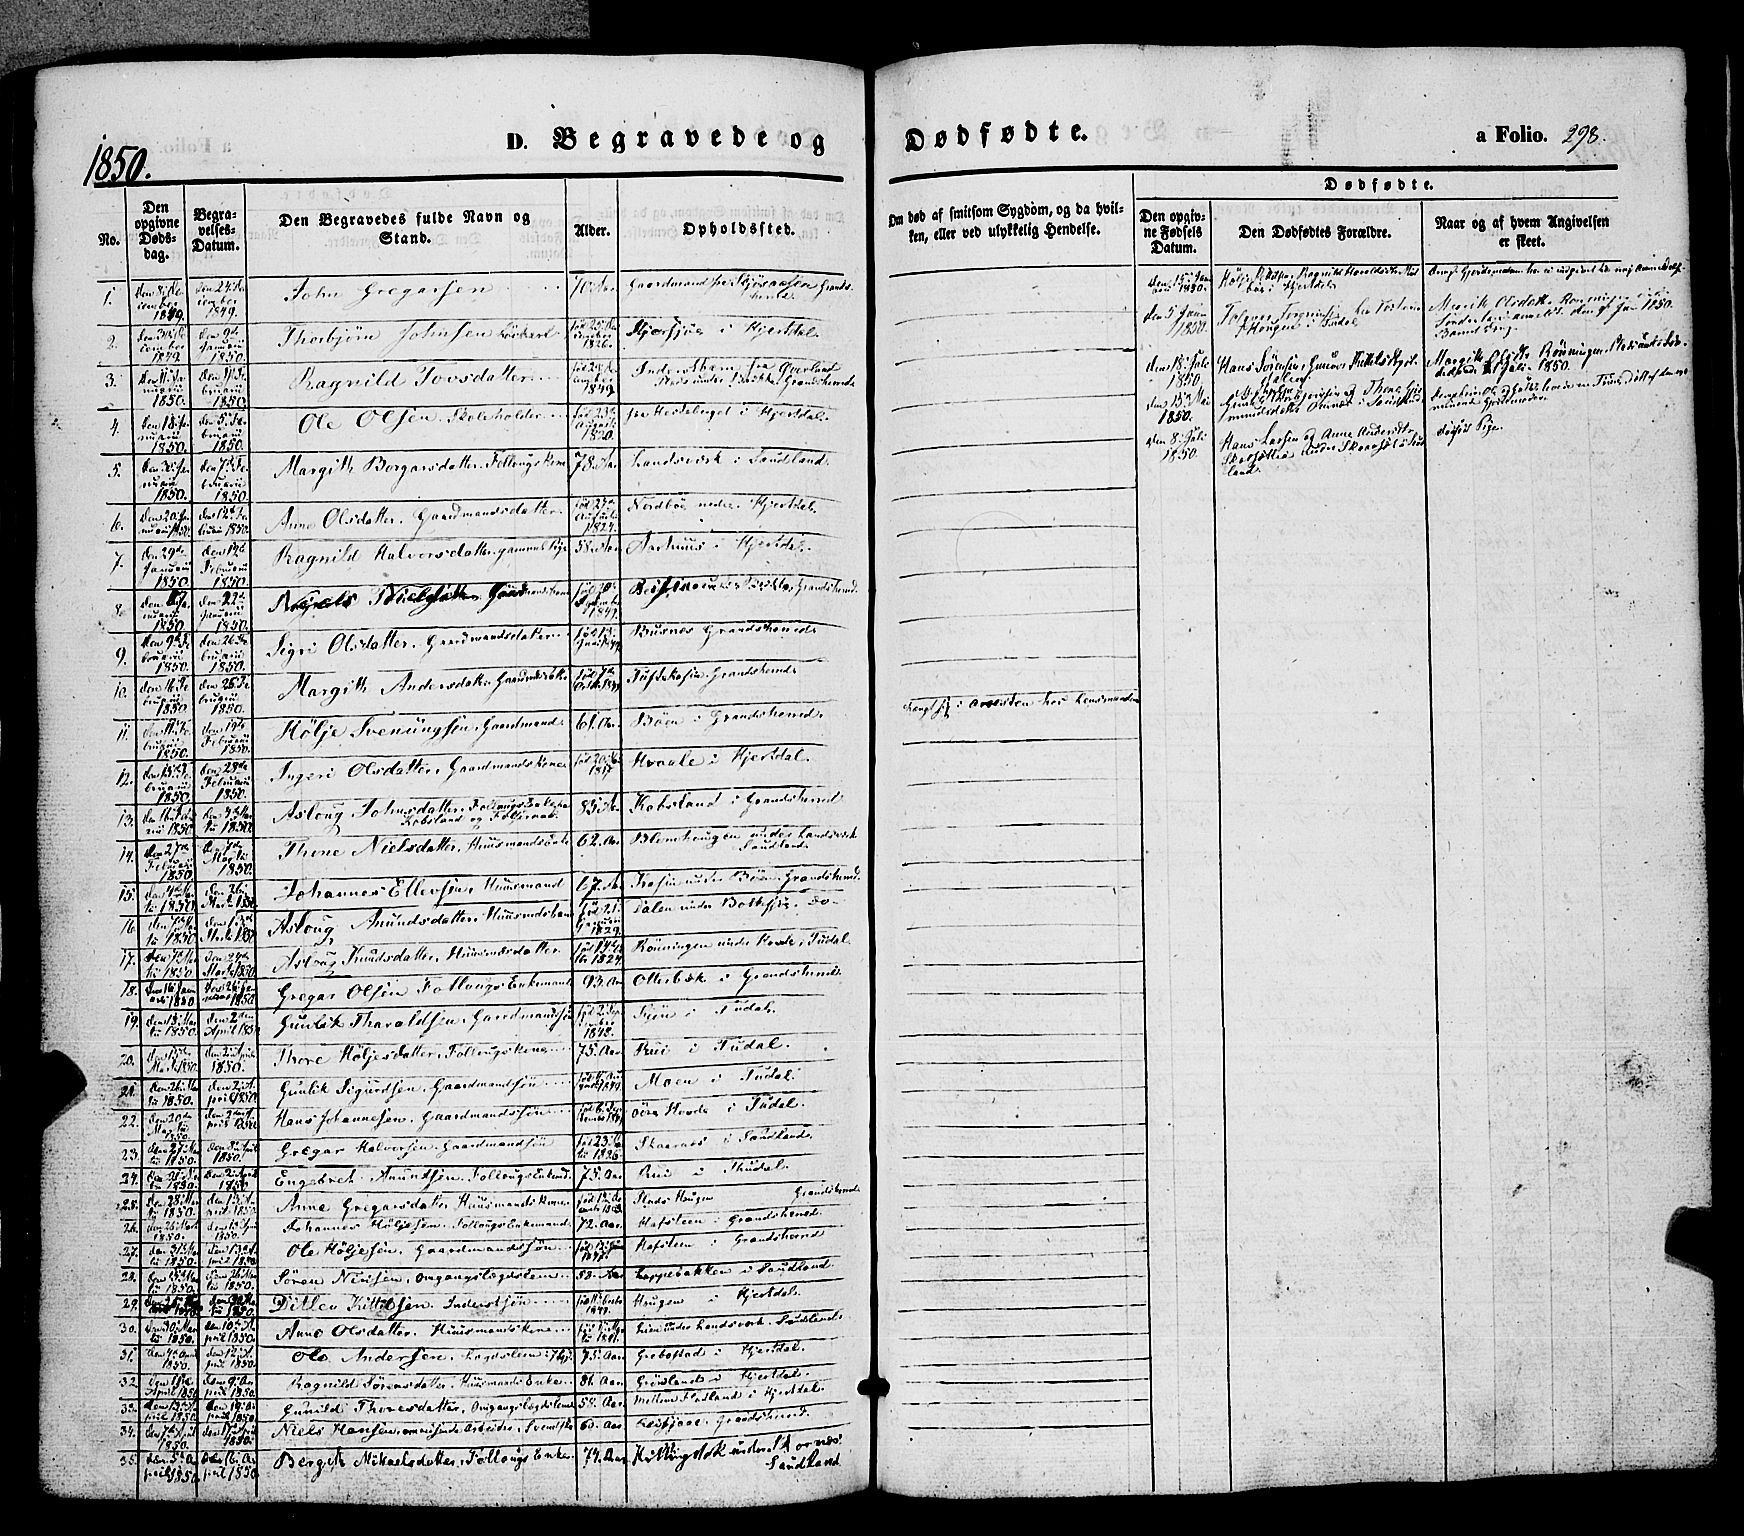 SAKO, Hjartdal kirkebøker, F/Fa/L0008: Ministerialbok nr. I 8, 1844-1859, s. 298